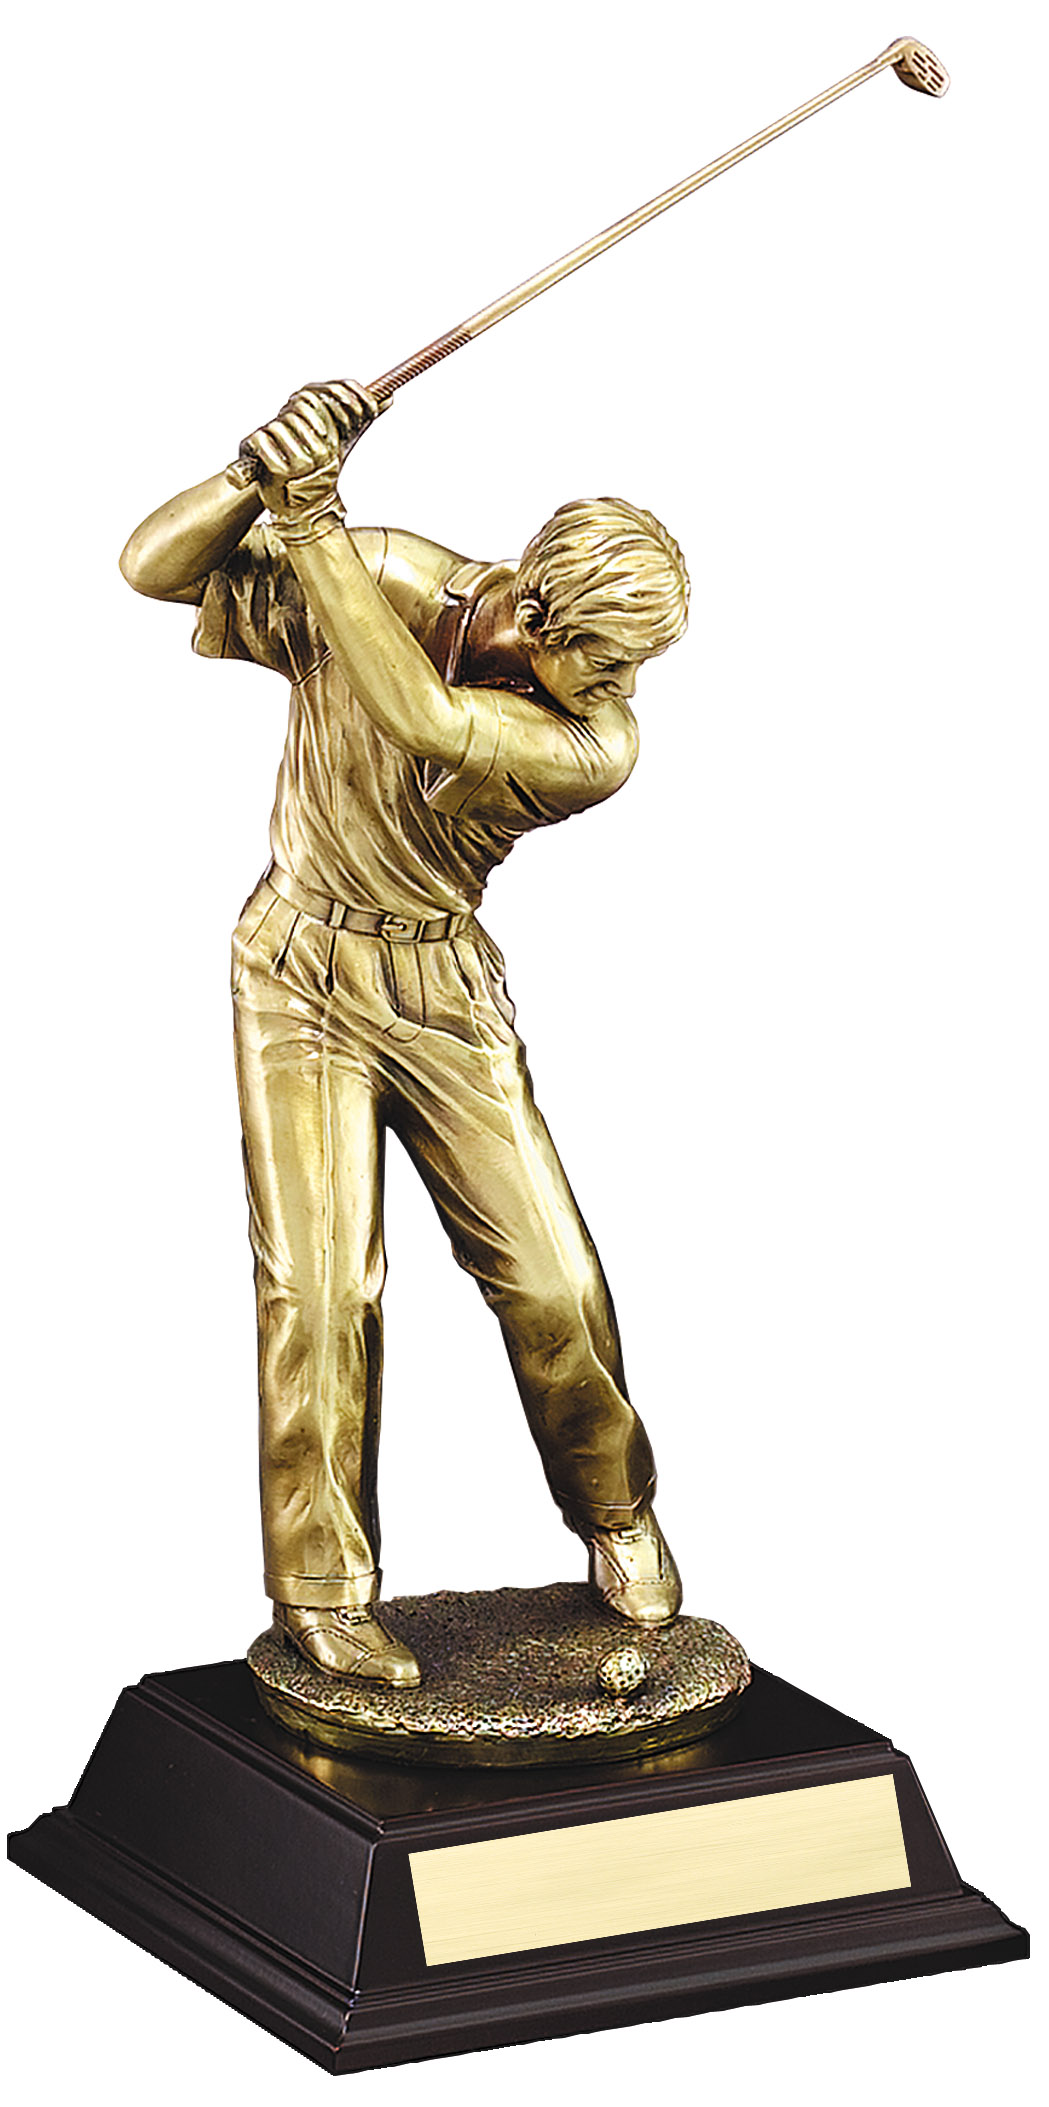 "Gold Metallic Resin - Driver, Male:    Large:  G2683 - 16.5"" tall -  $170    Medium:  G2682 - 13"" tall -  $57    Small:  G2681 - 10"" tall -  $42"